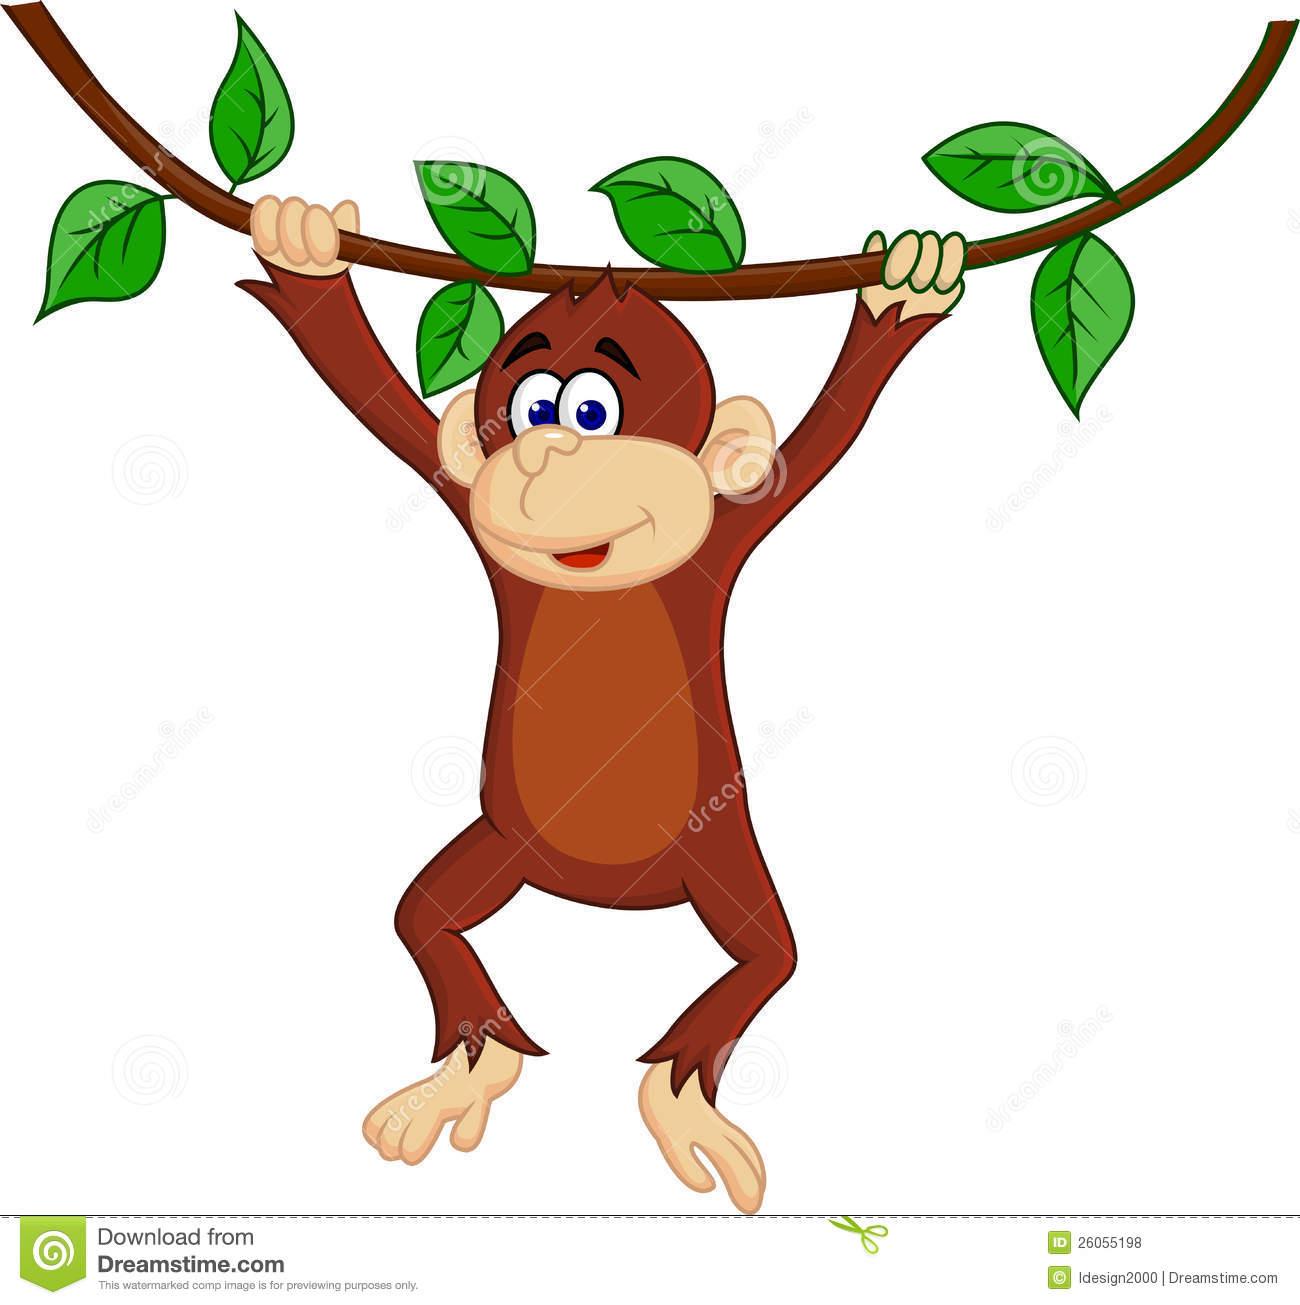 Free animations swinging on a vine